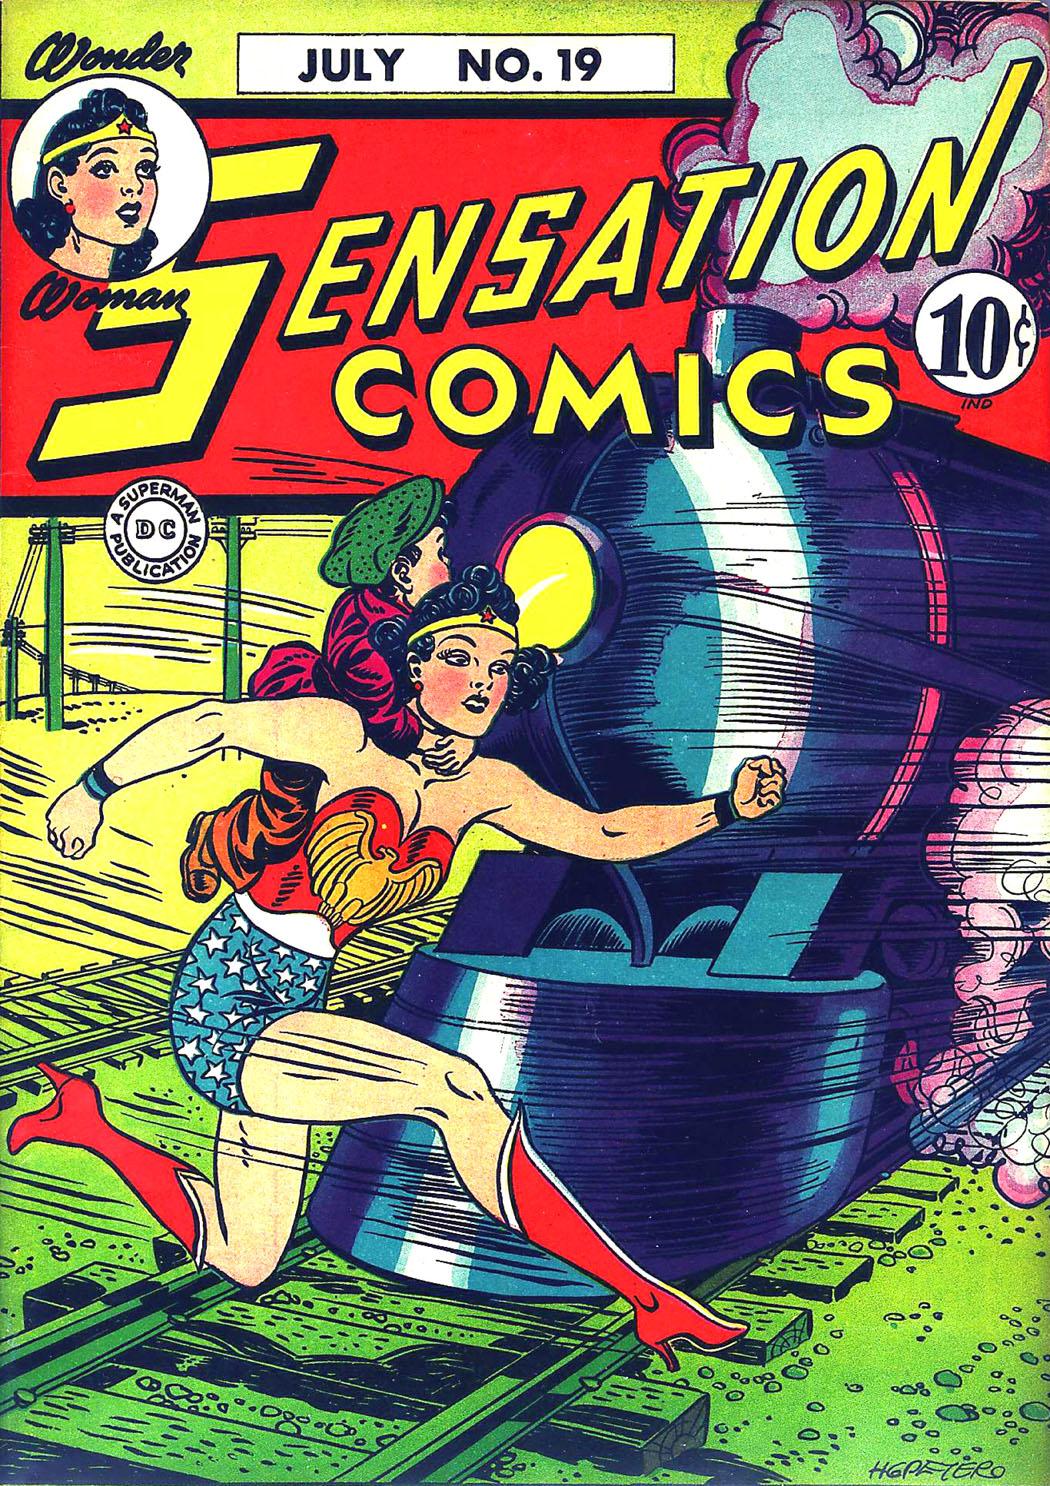 WW-berserk-01-sensation comics 19-01